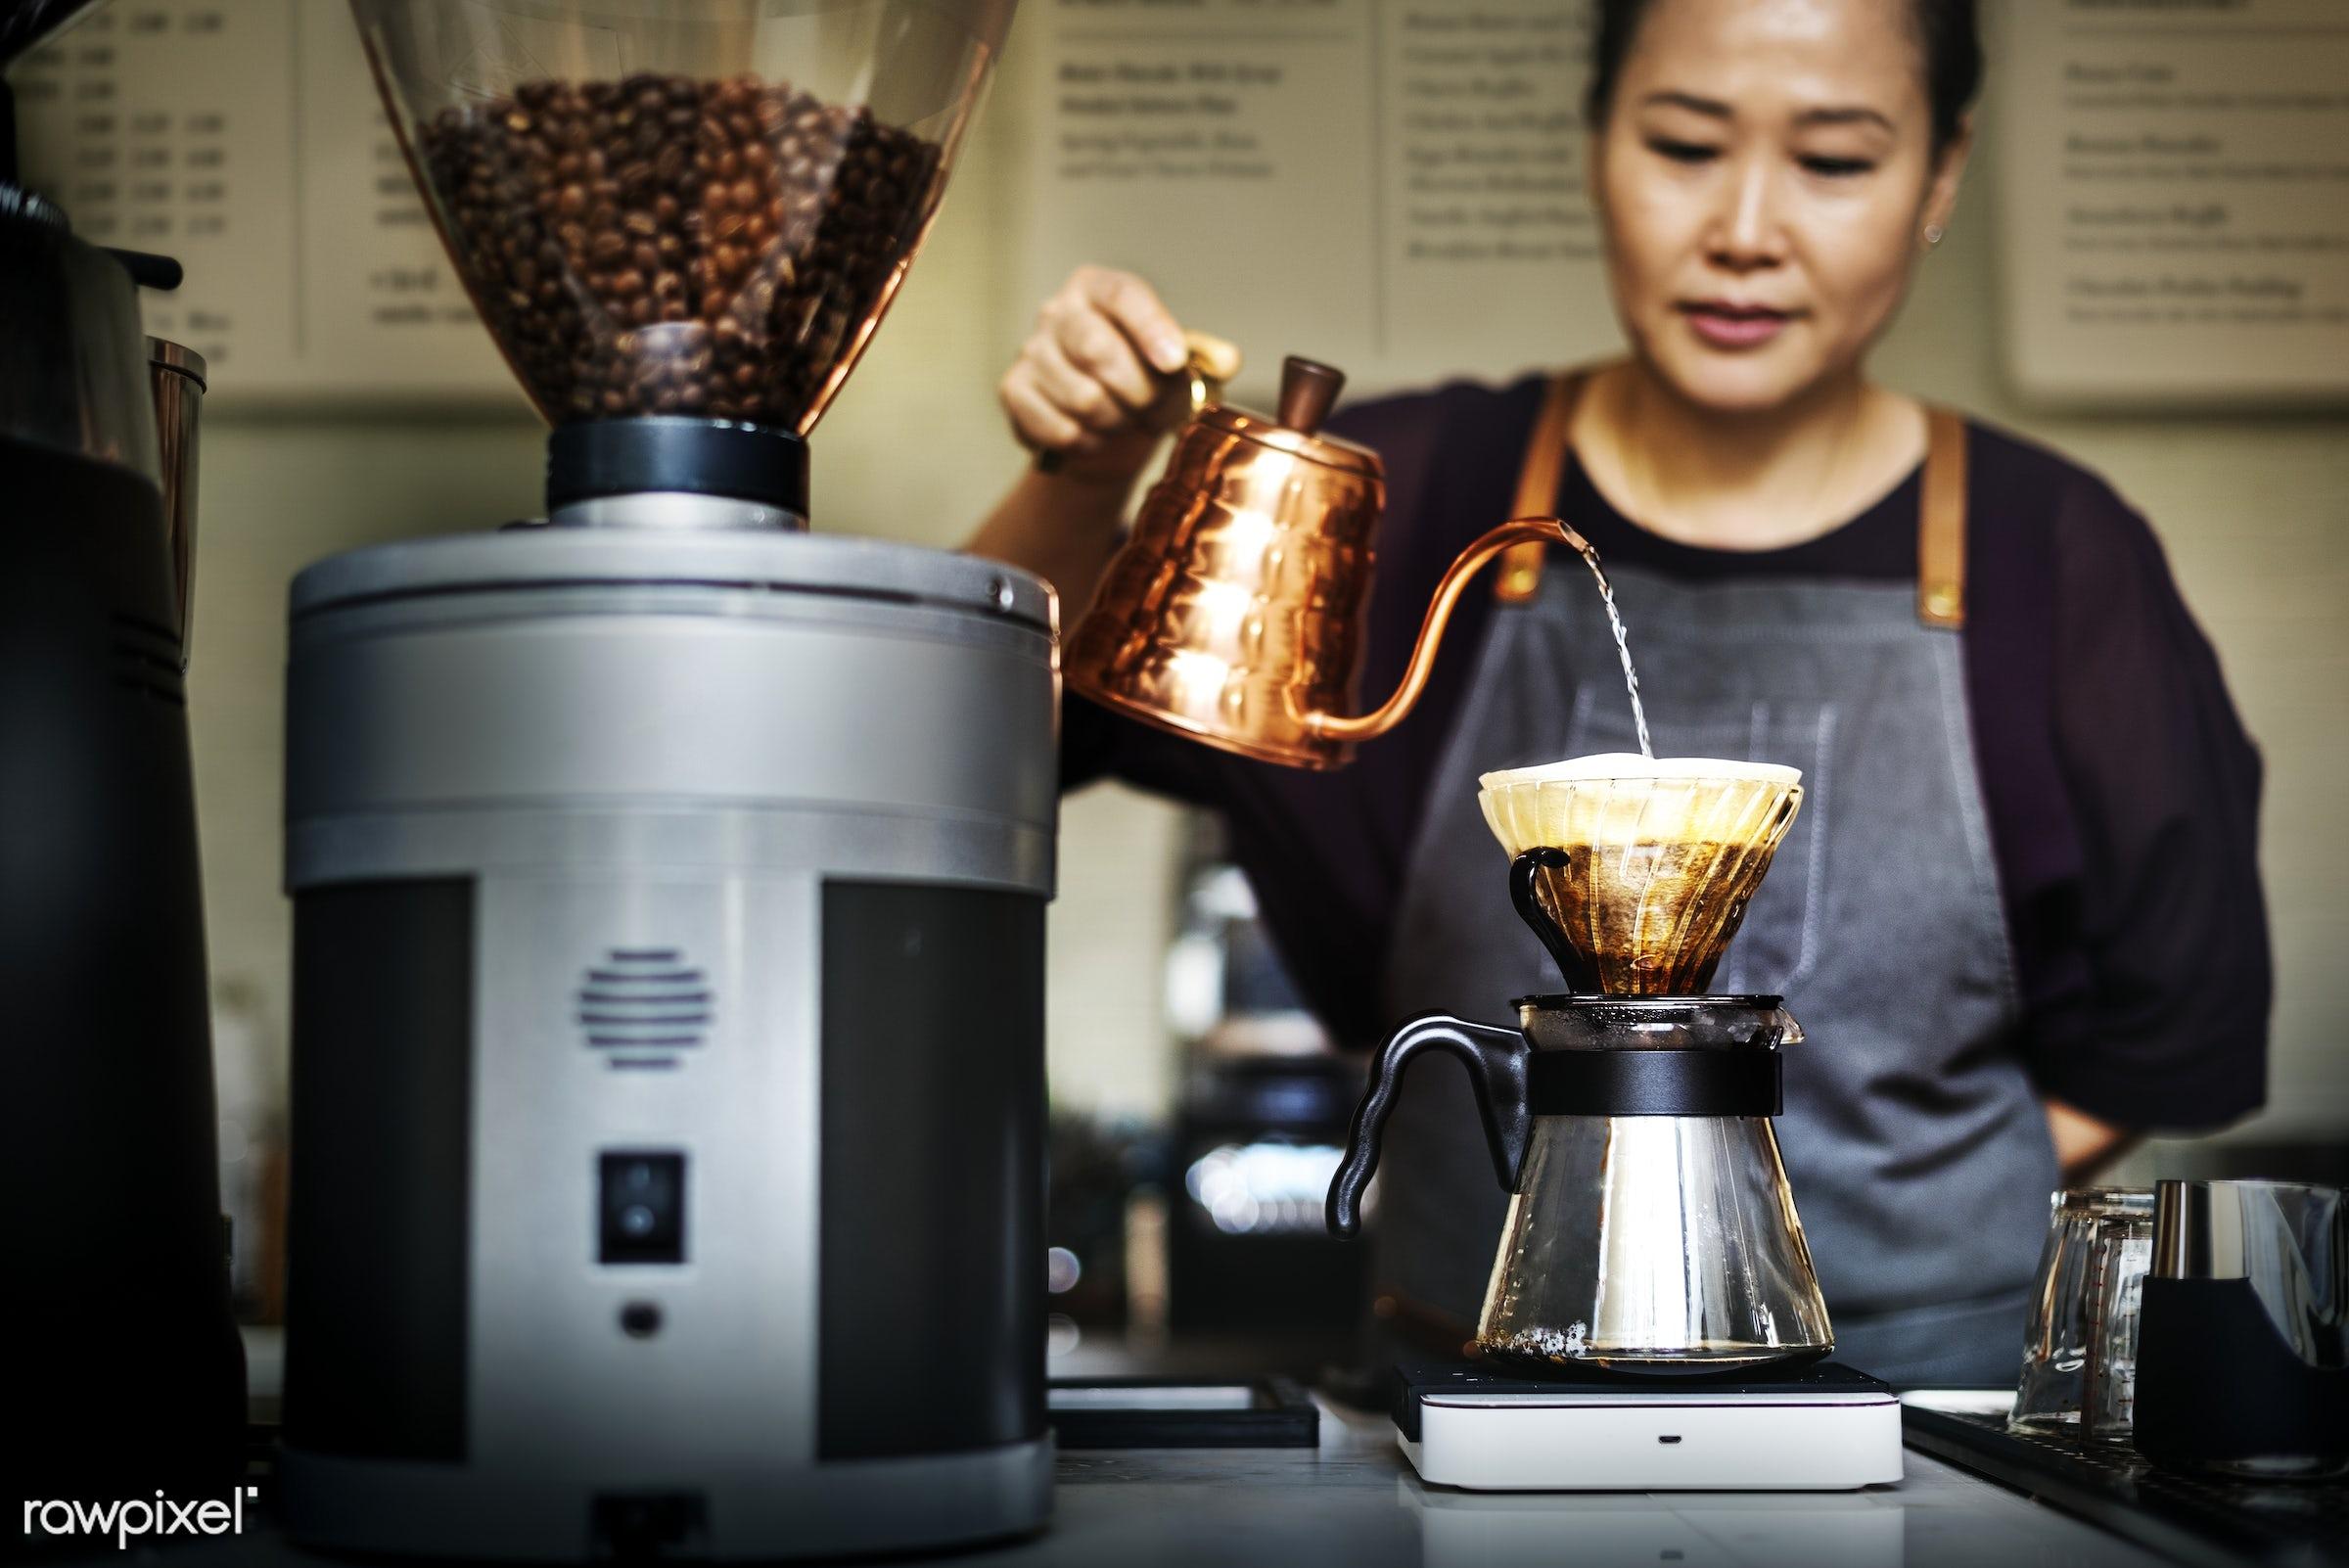 Barista is making coffee - coffee shop, alone, asian, barista, beverage, brew, career, coffee, drink, drip, jug, machine,...